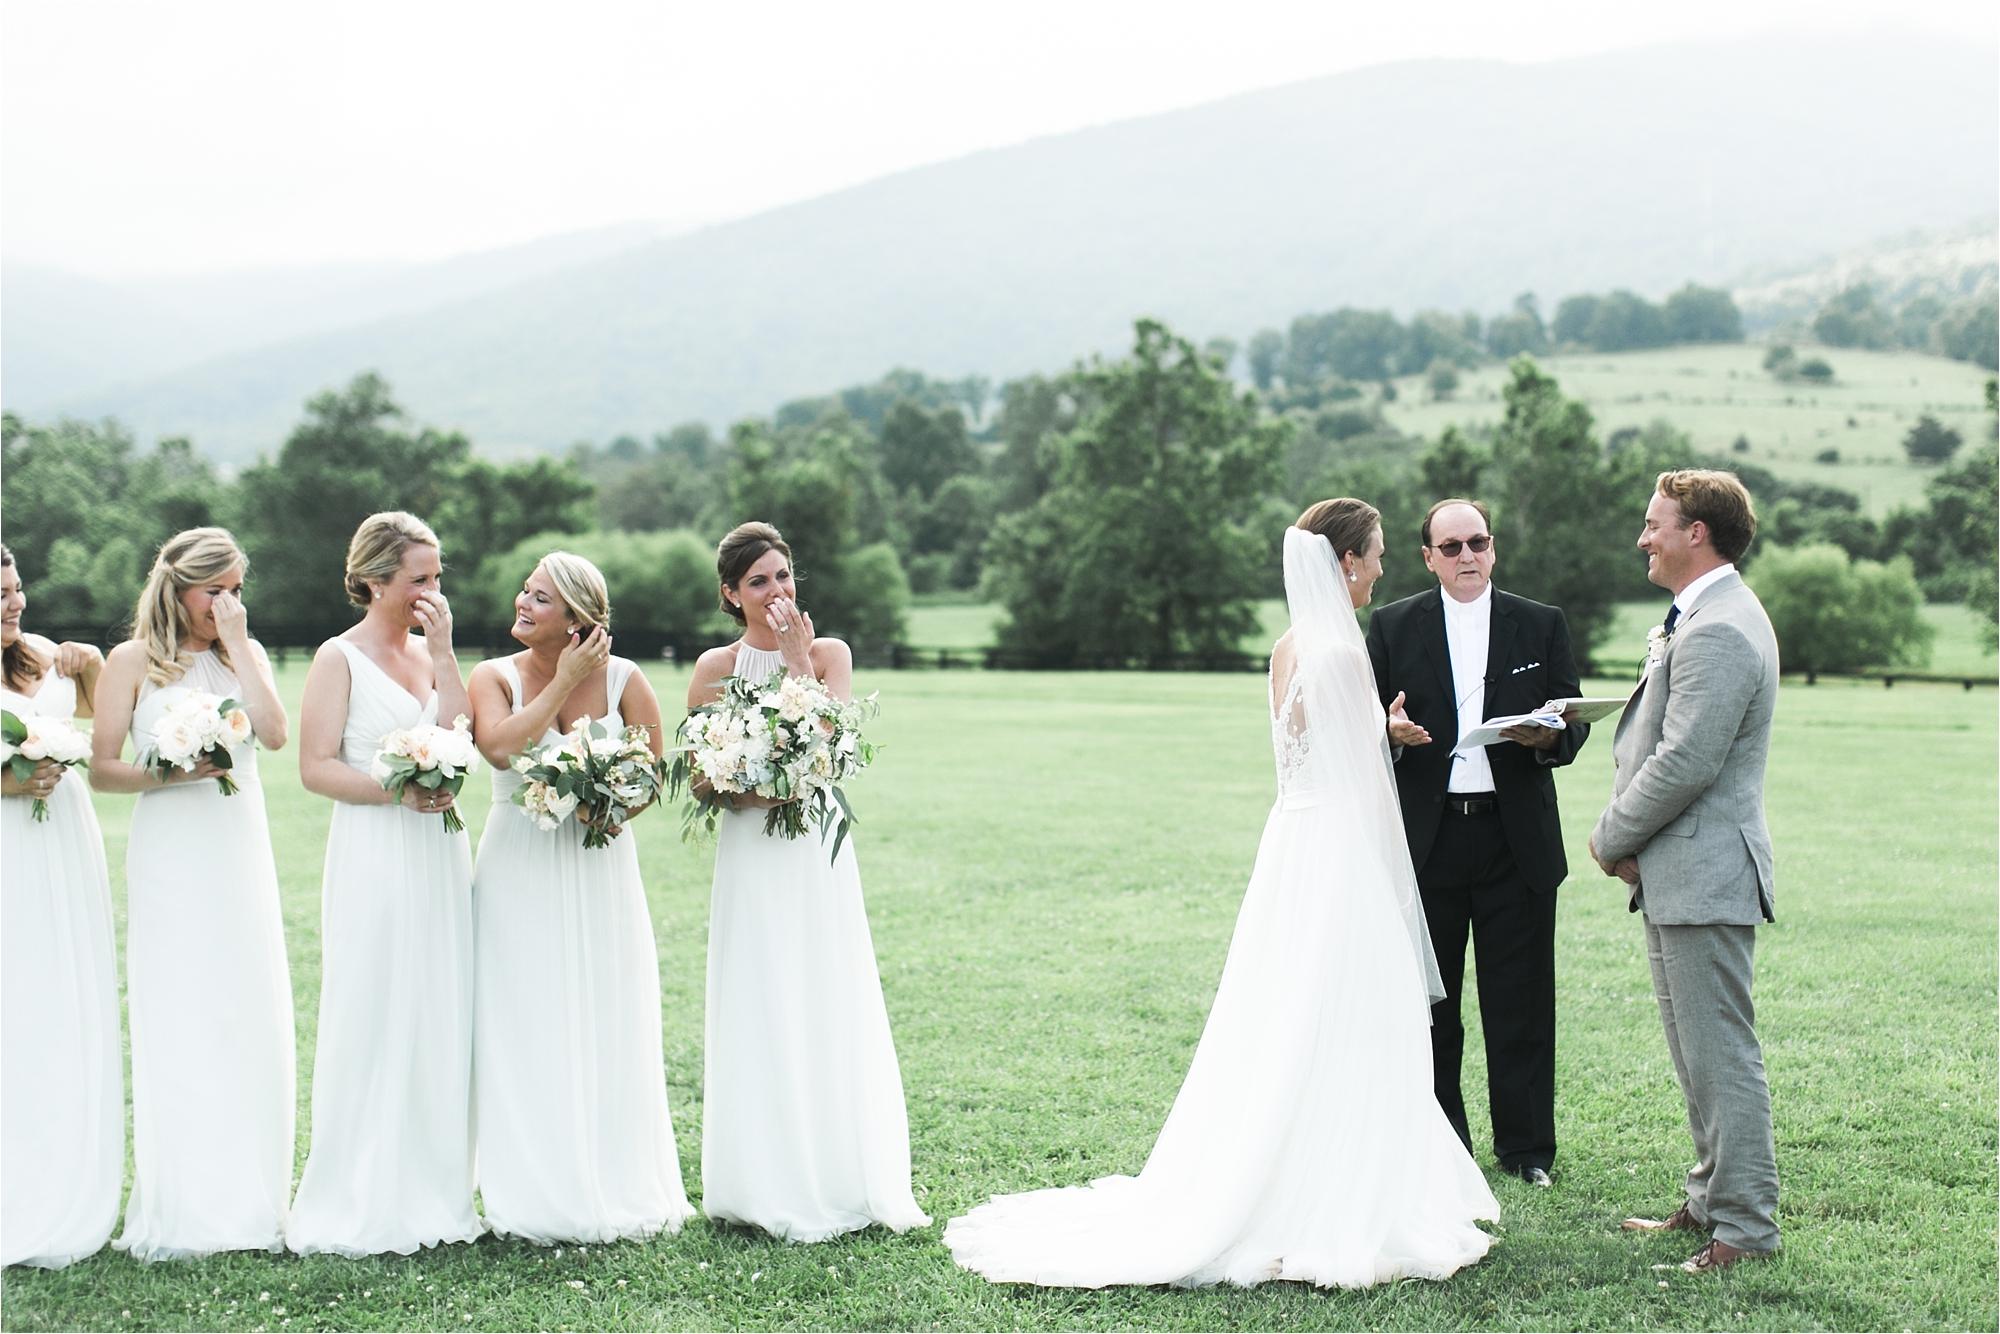 stephanie-yonce-charlottesville-virginia-king-family-vineyard-wedding-photos_0035.jpg